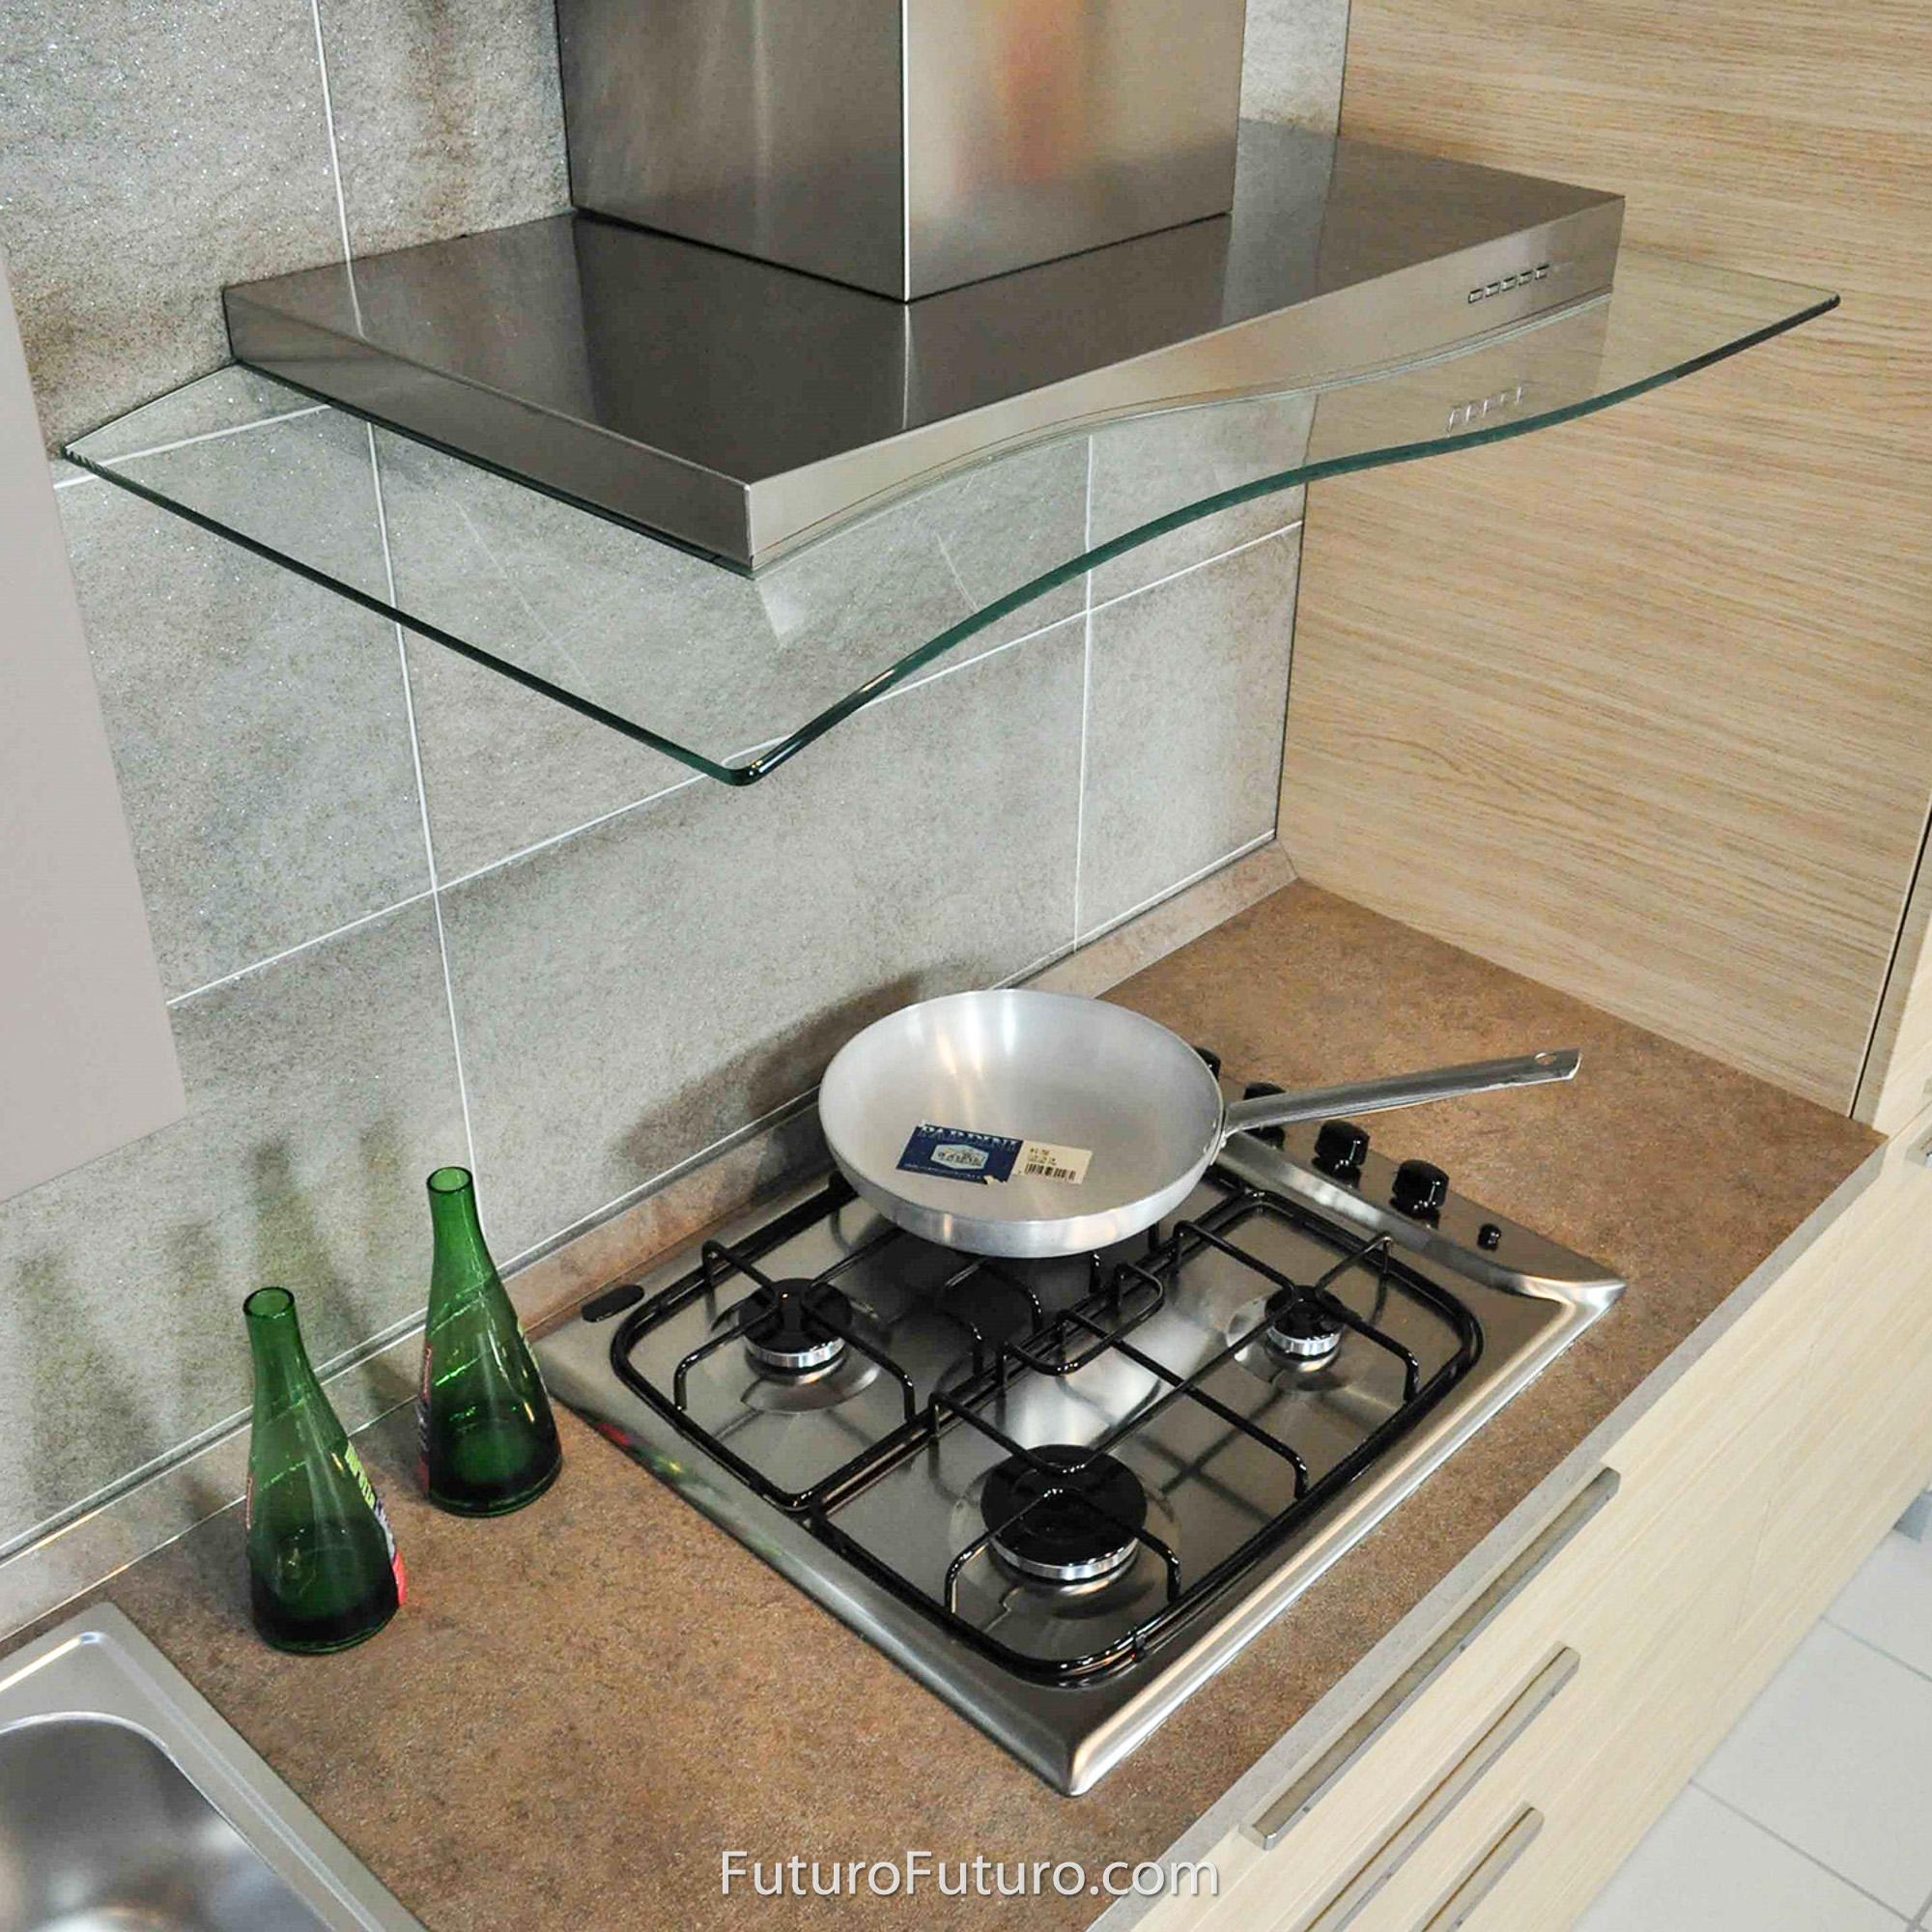 range hood 36 inch mystic glass wall mount by futuro futuro